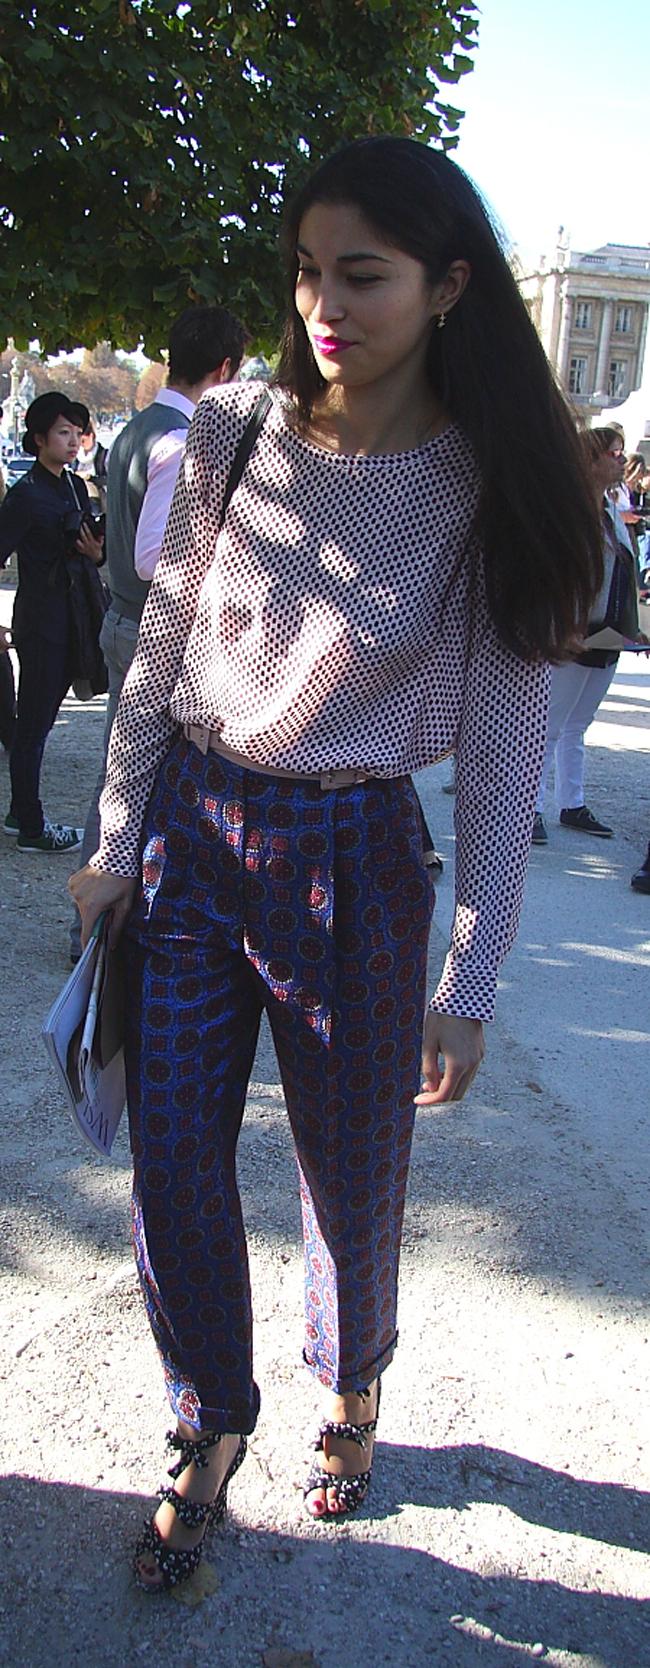 Modepilot-Streetstyle-Mustermix-Fashionweek-Paris-Mode-Blog-Barbara Markert